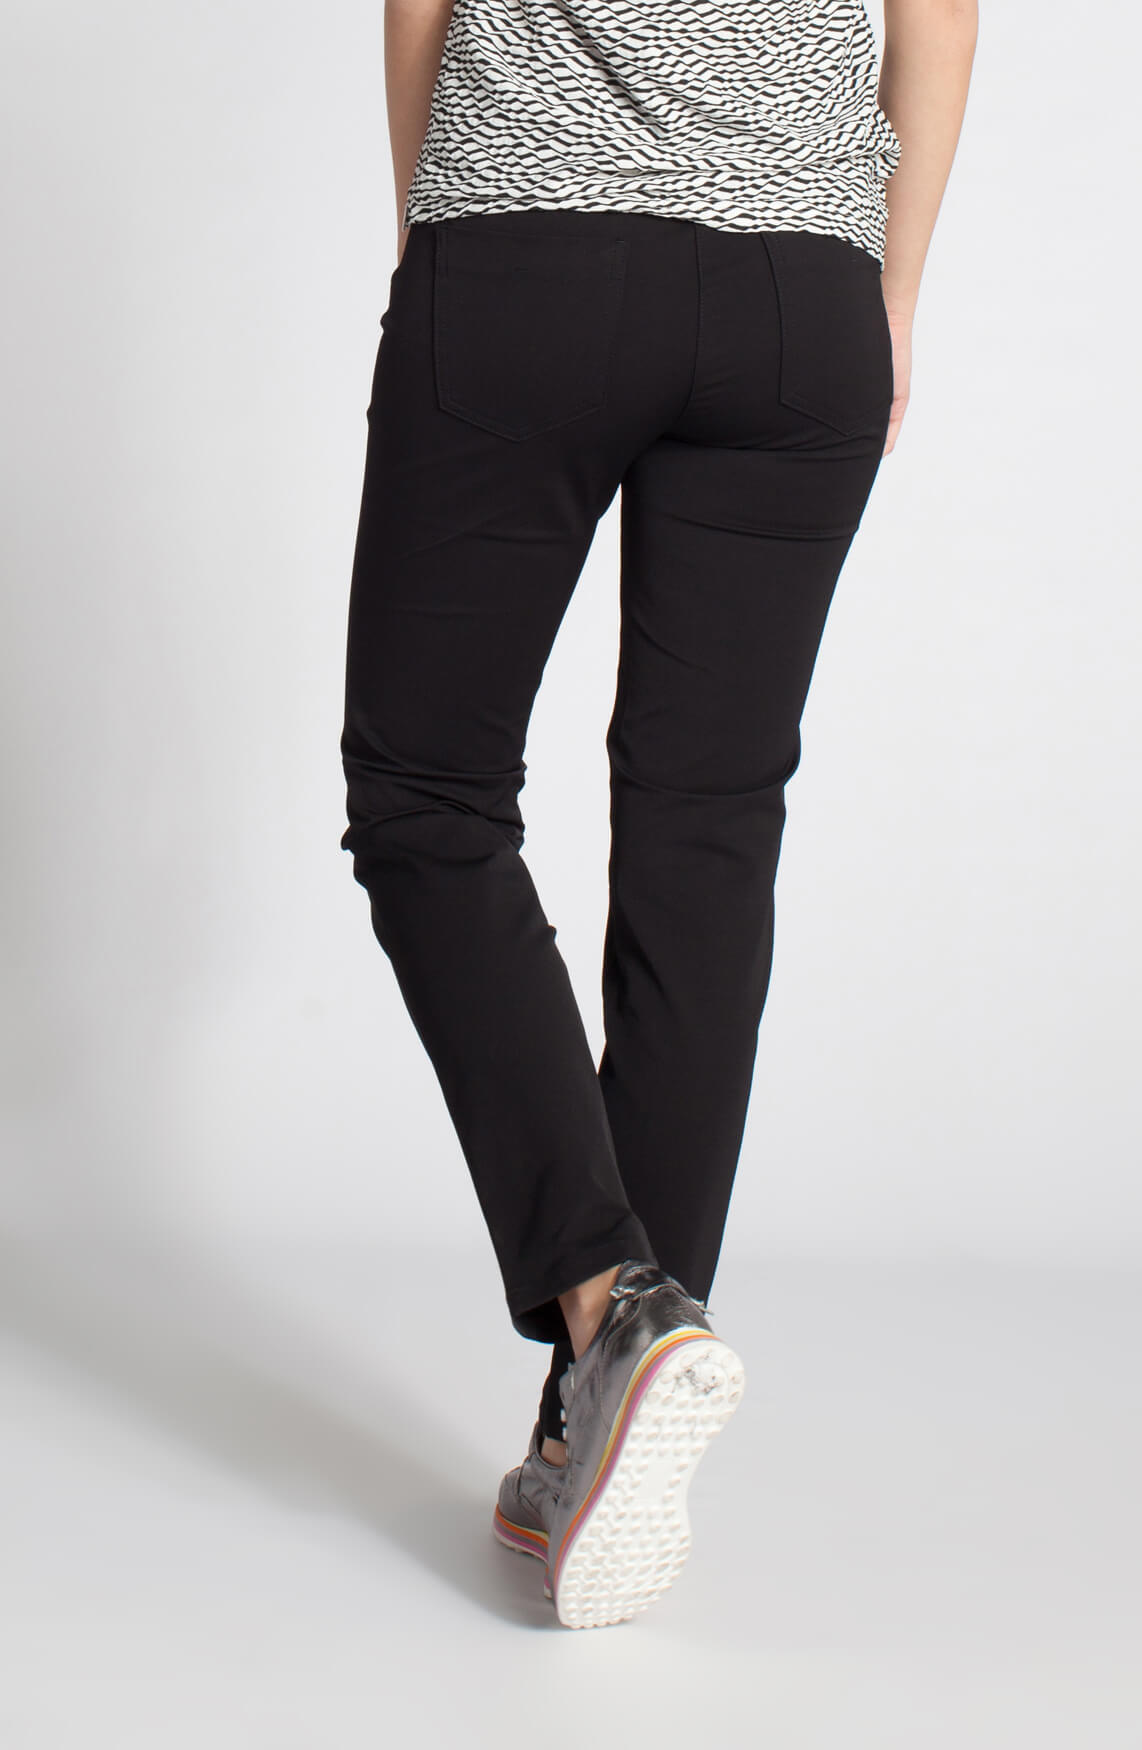 Rosner Dames Audrey pantalon zwart 0